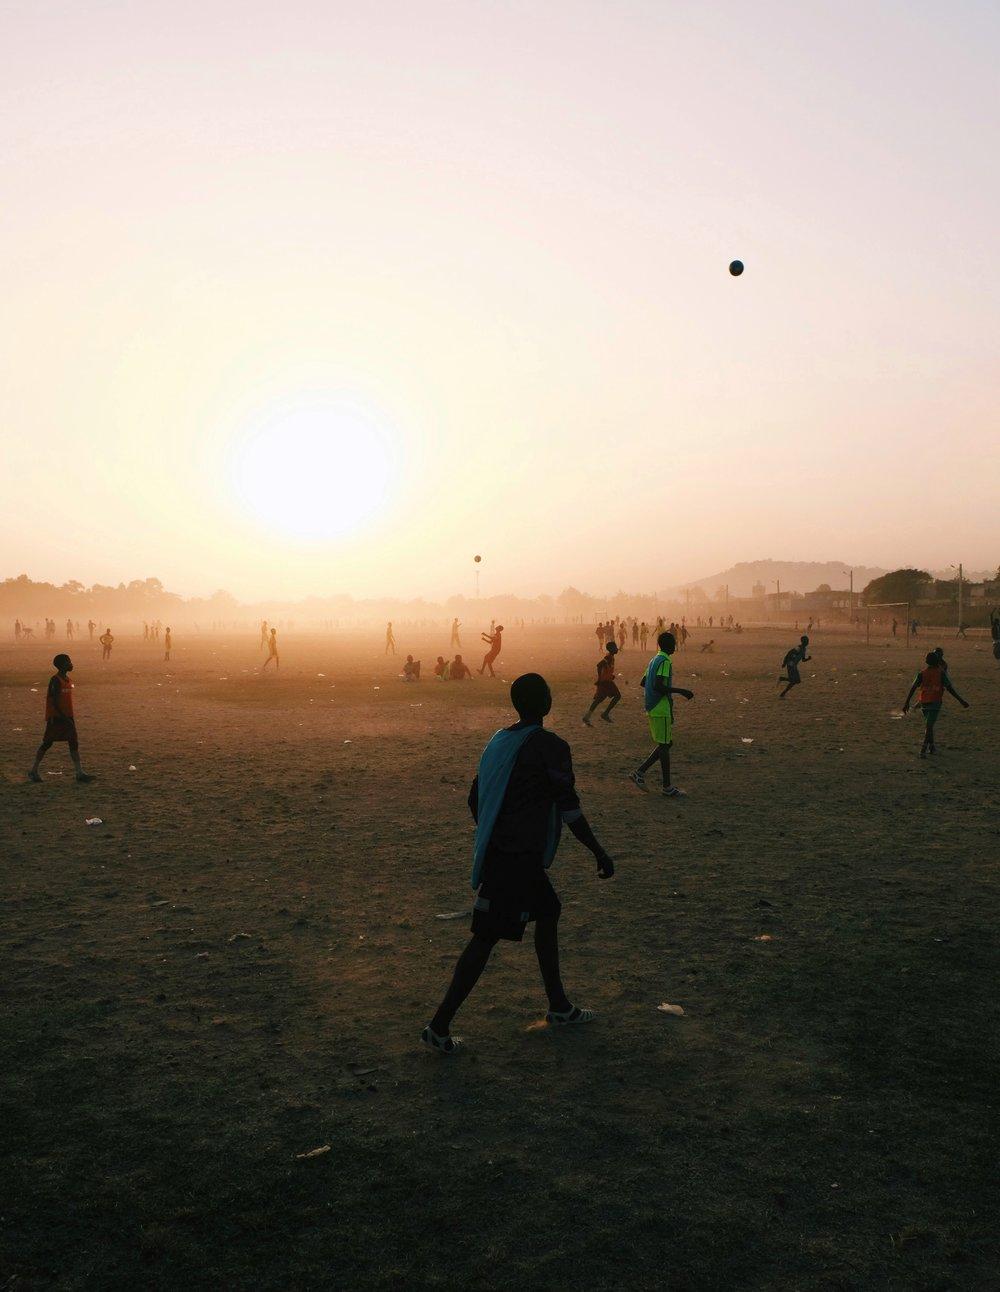 Soccer at Hippodrome Bamako by Joost Bastmeijer in Mali.jpeg